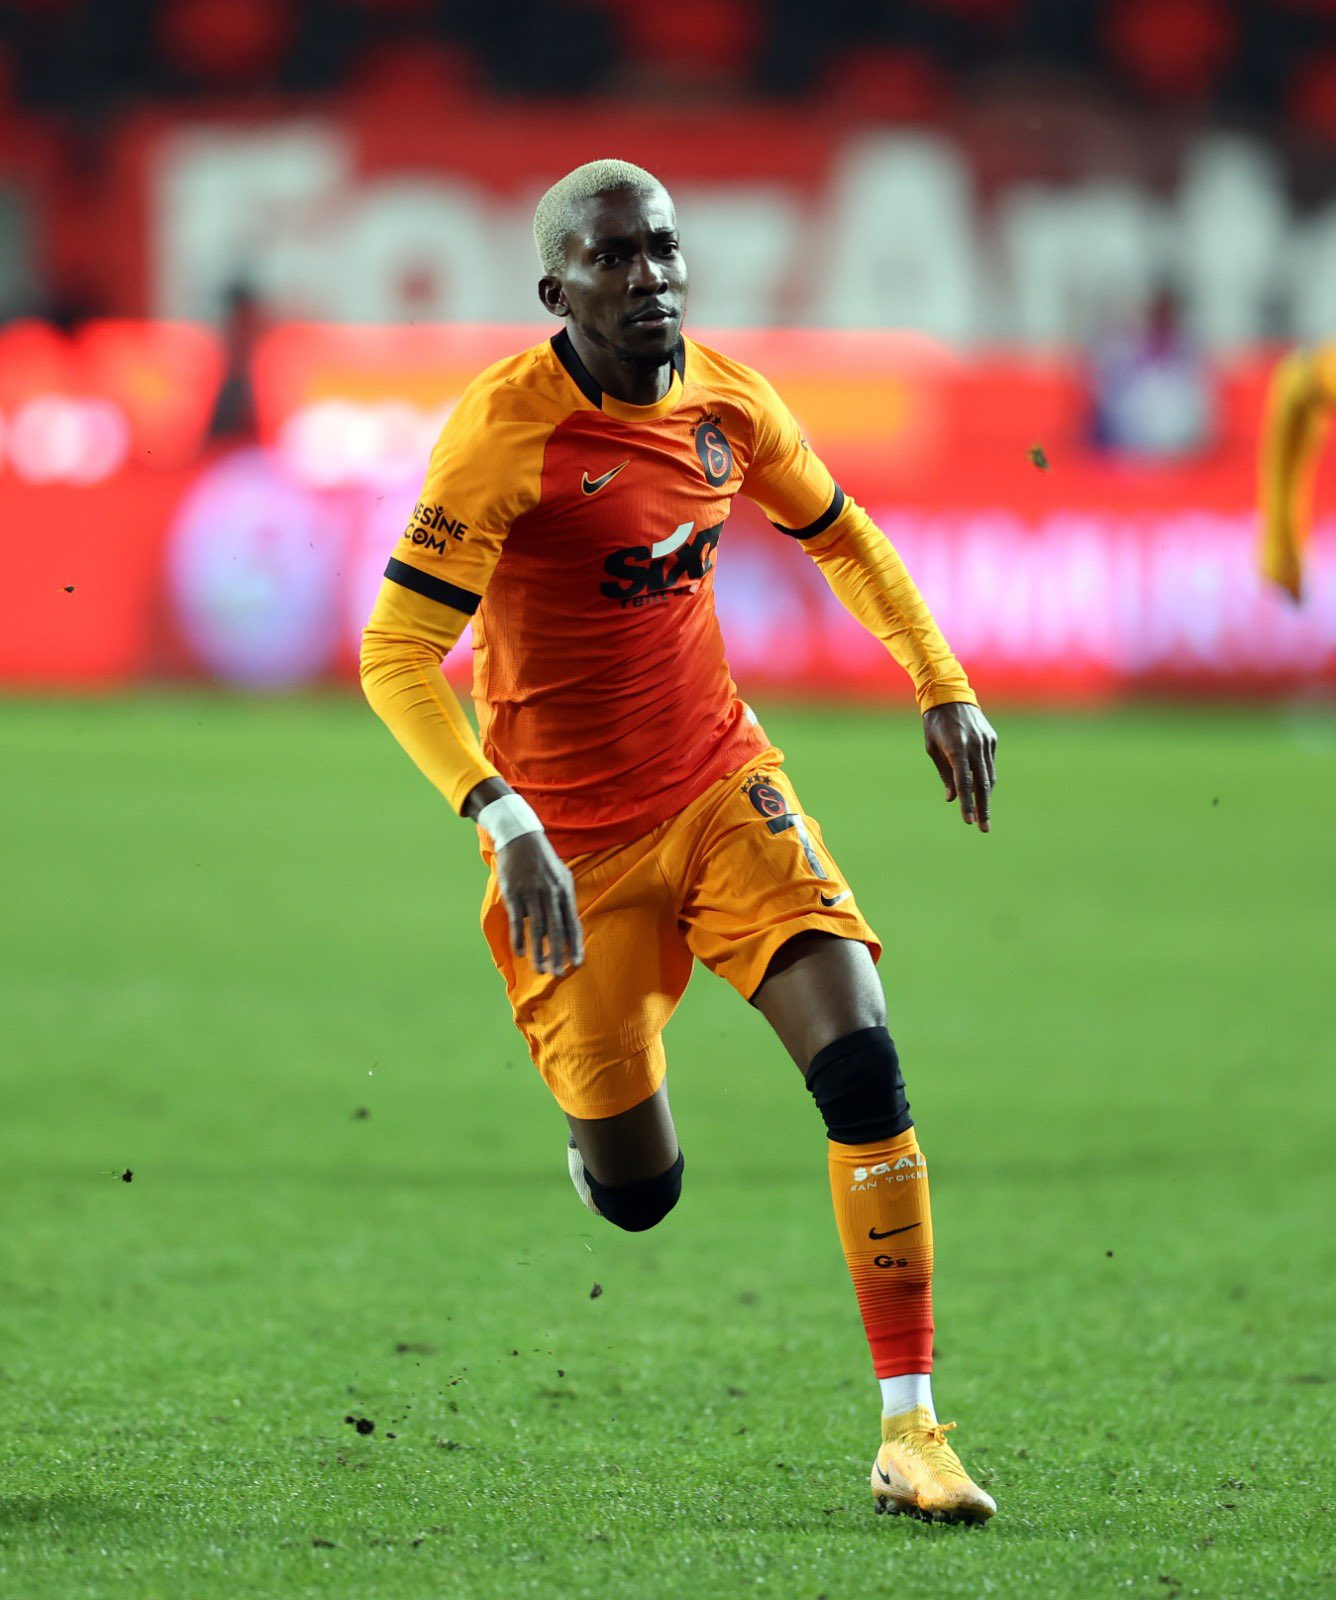 Turkey : Onyekuru Shines As Galatasaray Stun Fenerbahce Away